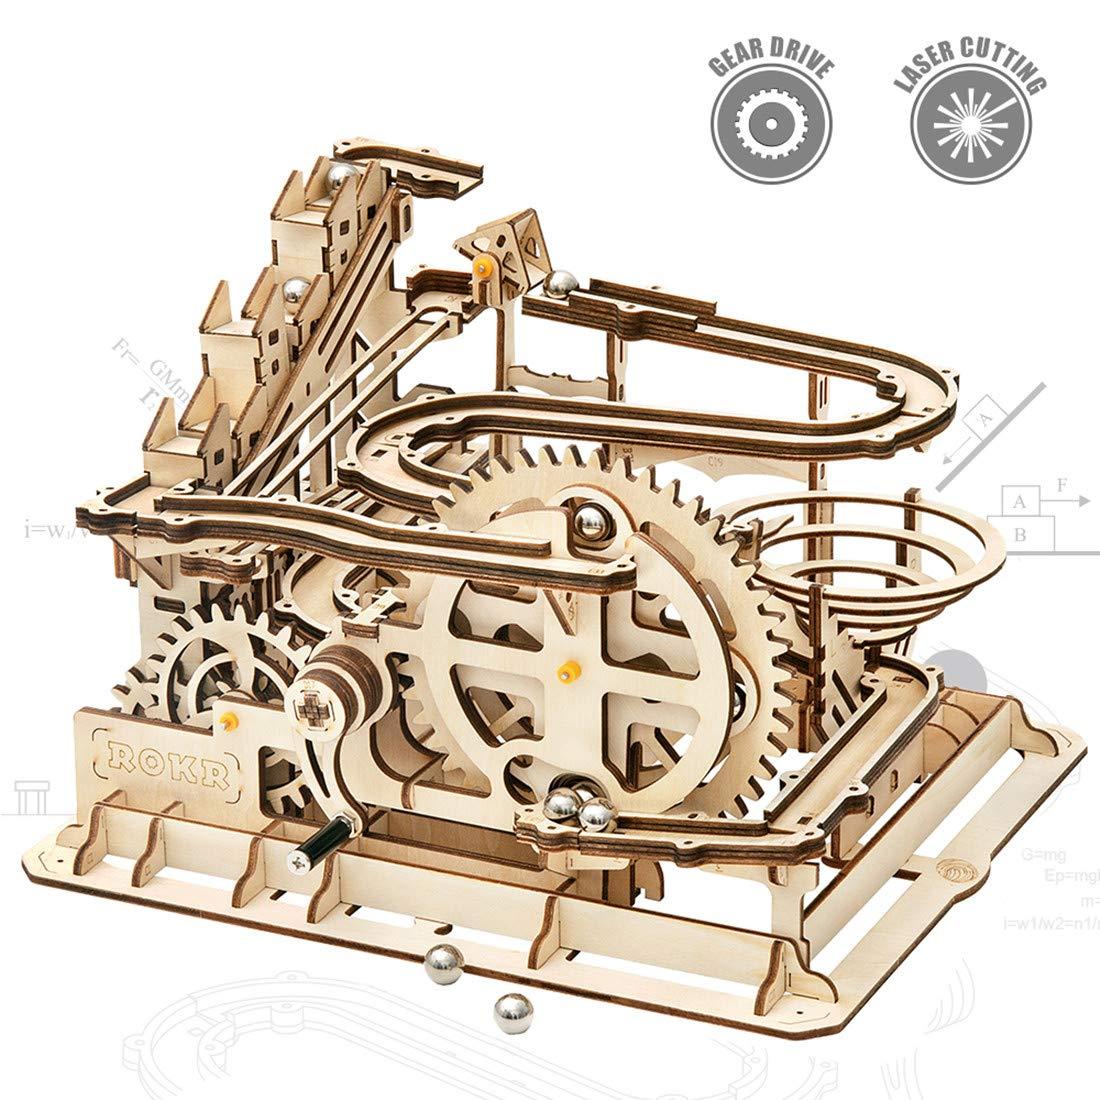 ROKR Mechanical Educational Engineering Thanksgiving